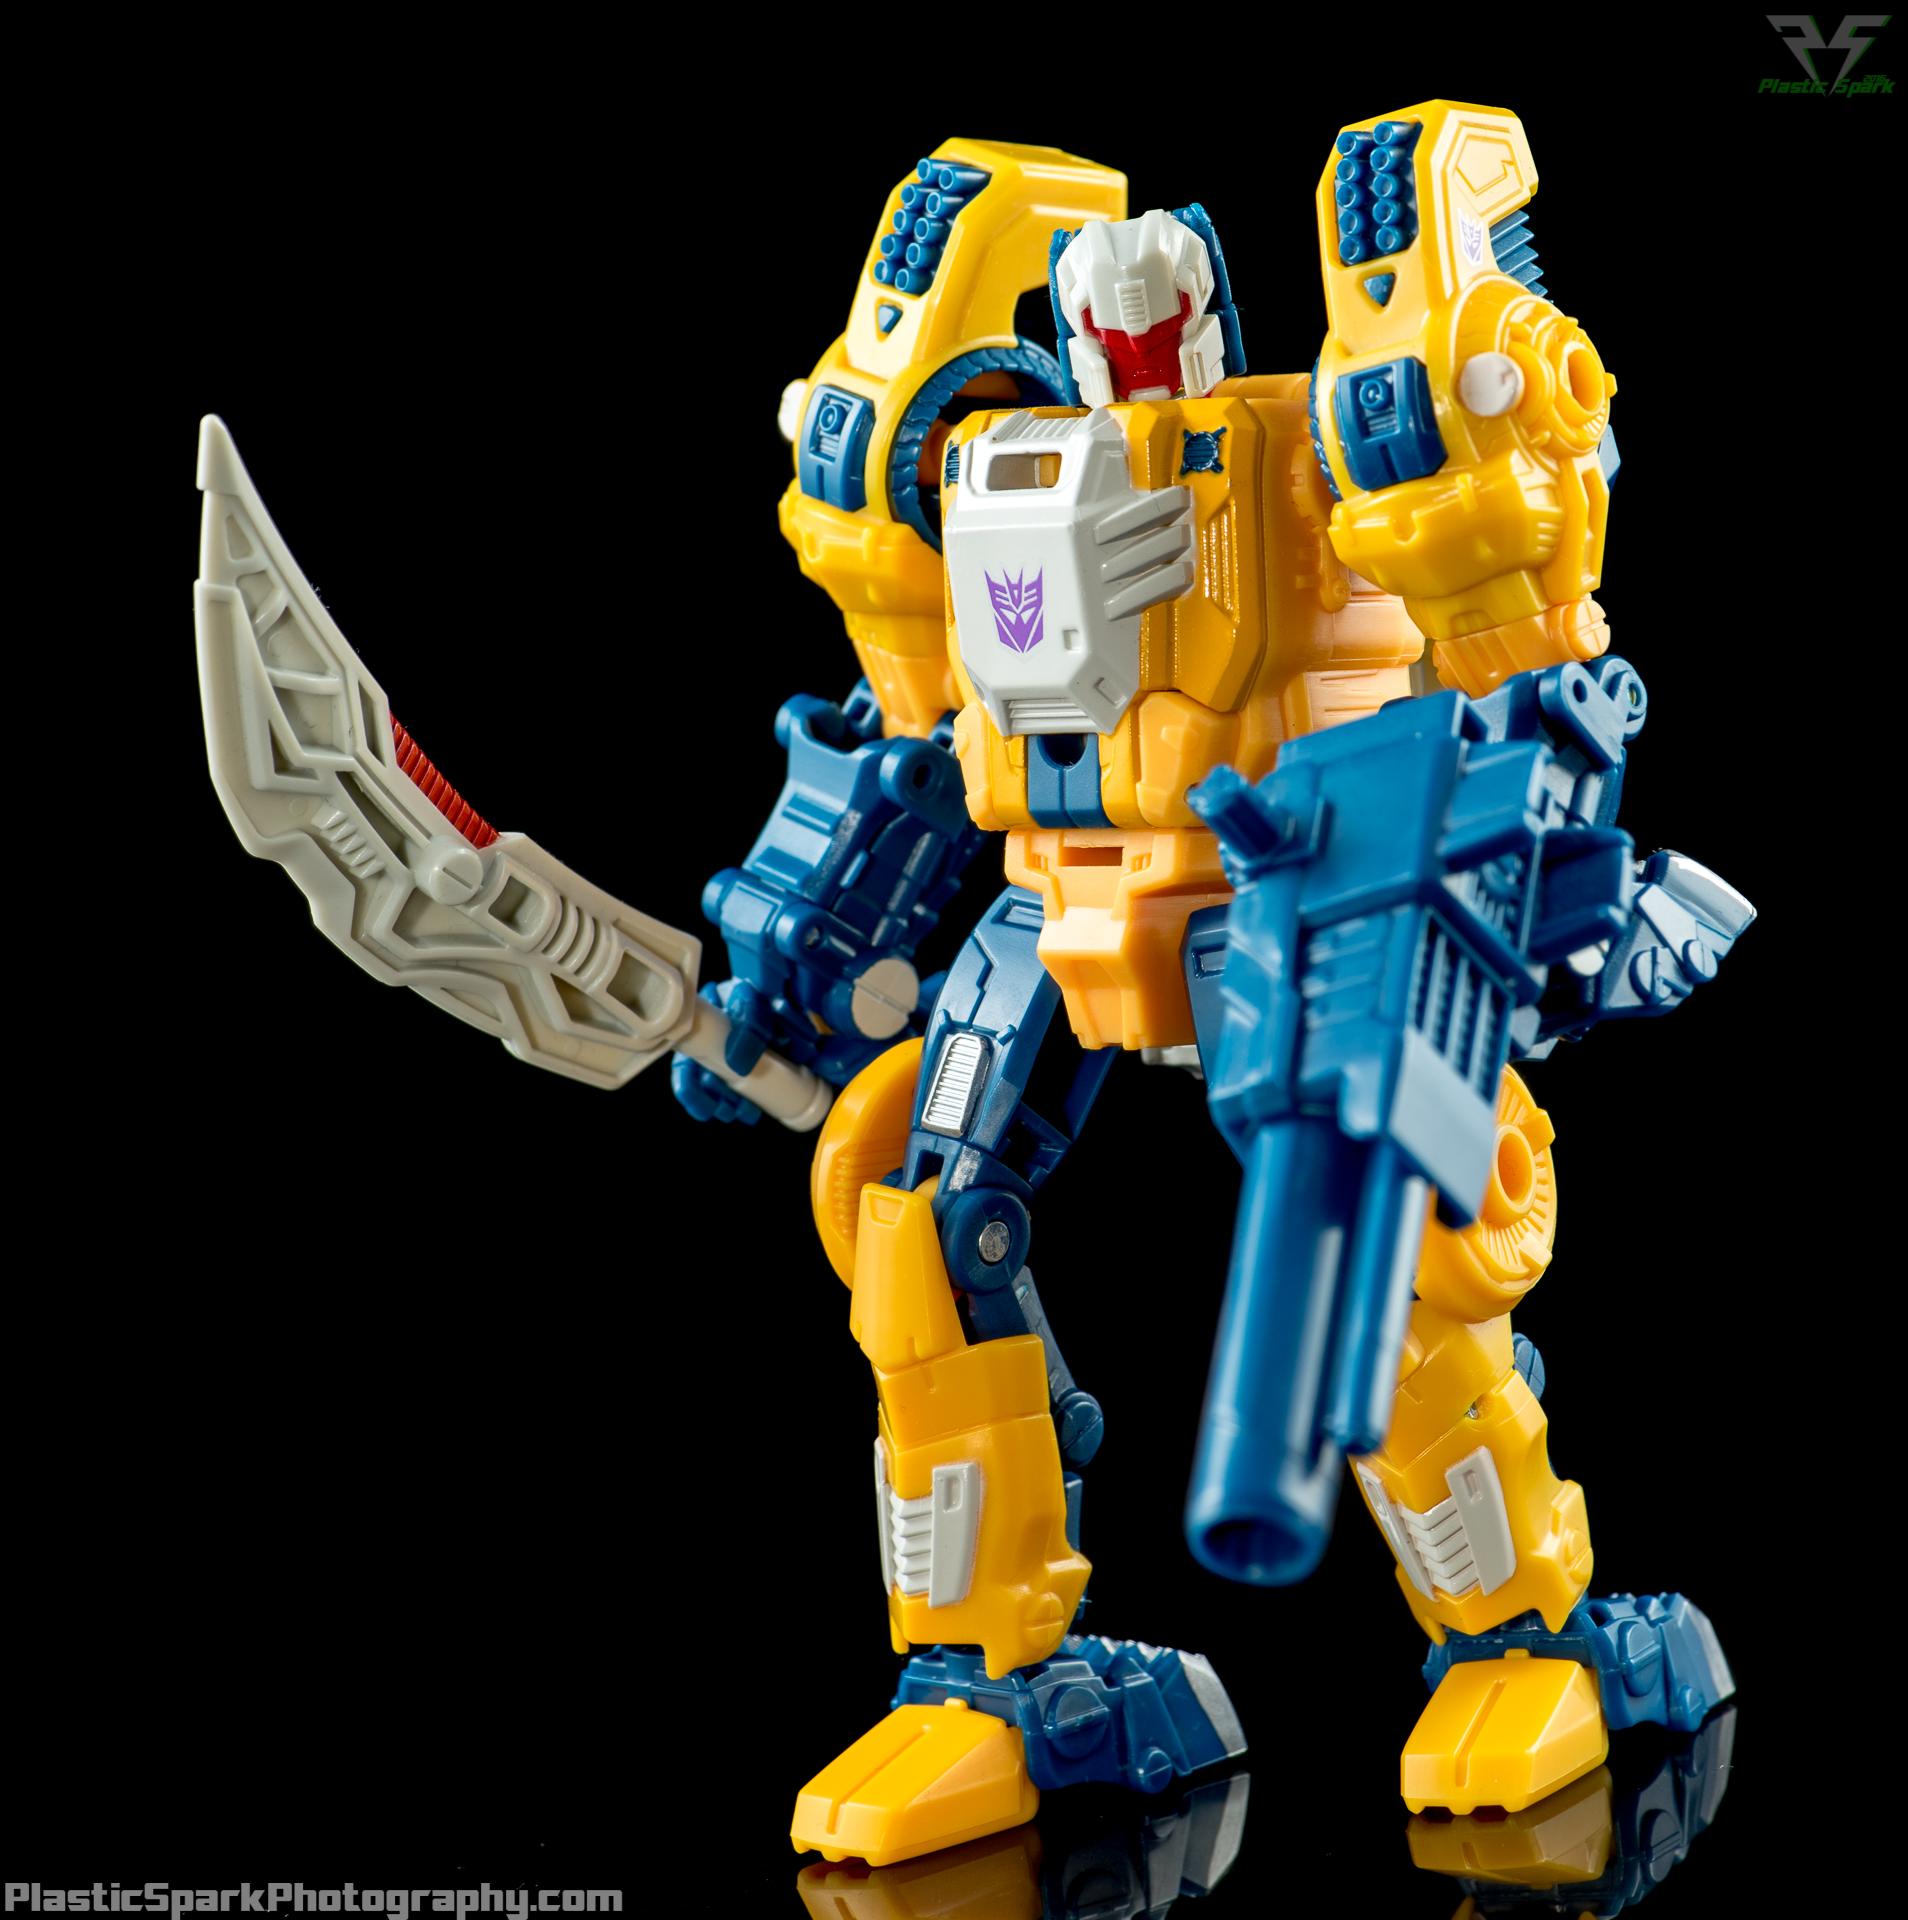 Titans-Return-Weirdwolf-(7-of-11).png